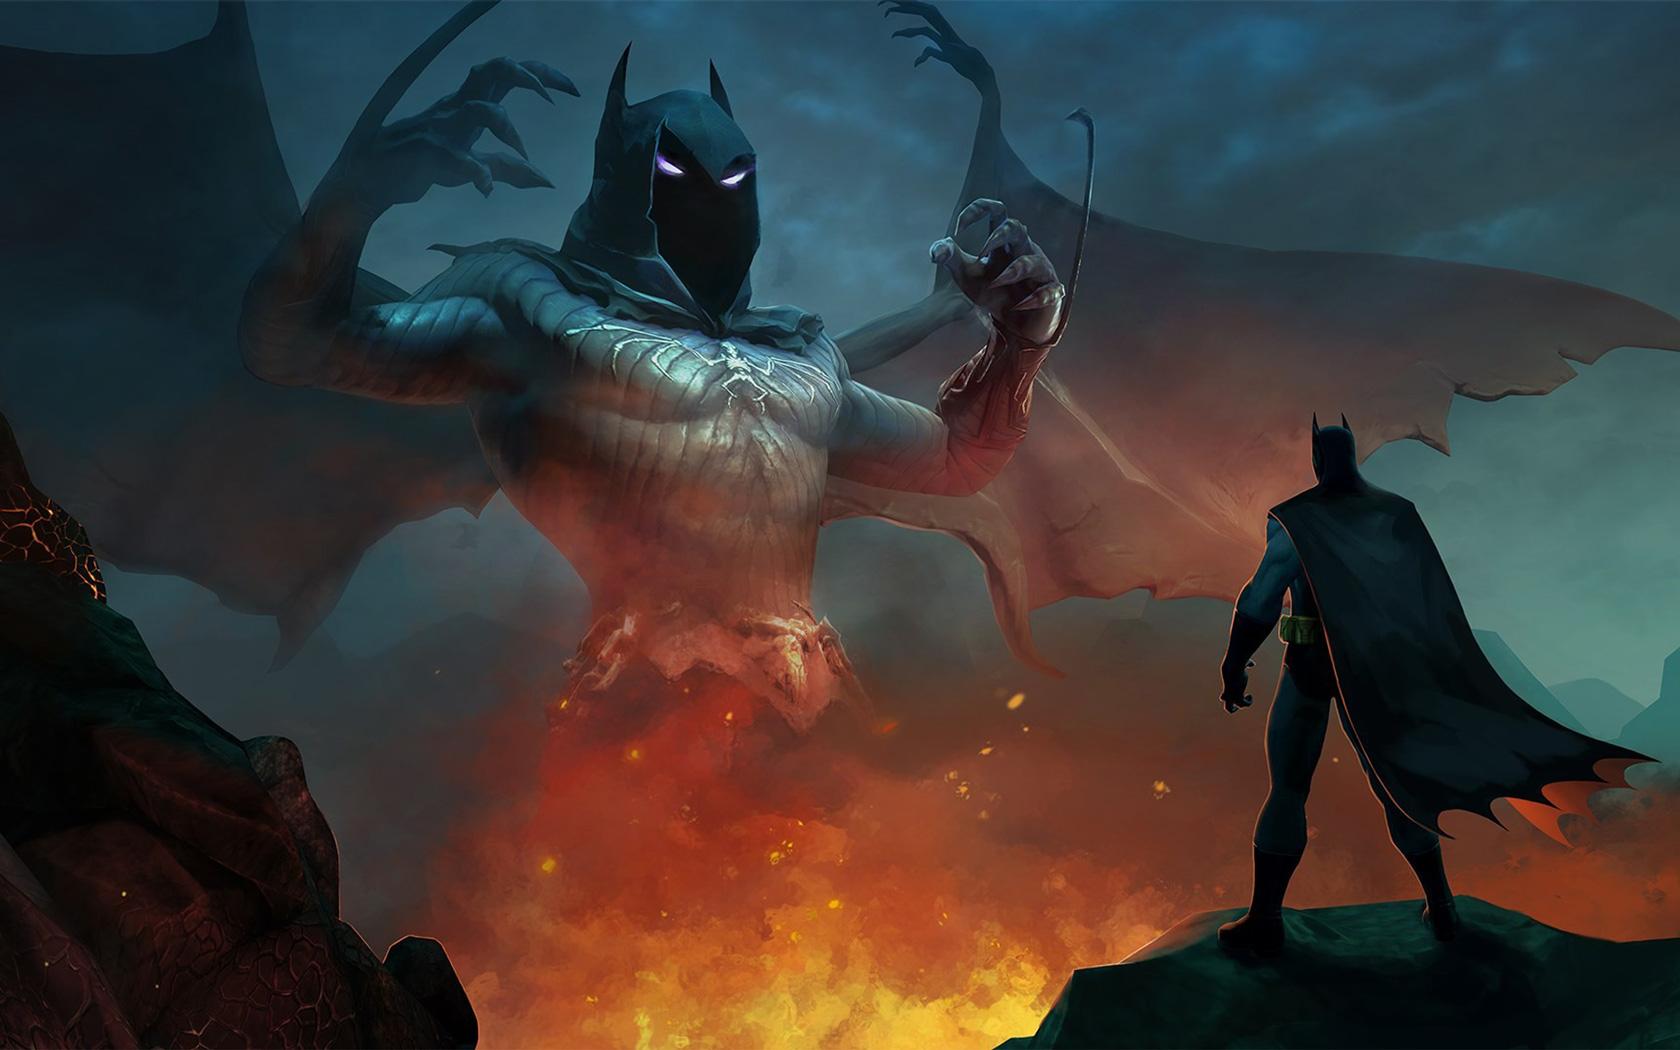 DC Universe Online Wallpaper in 1680x1050